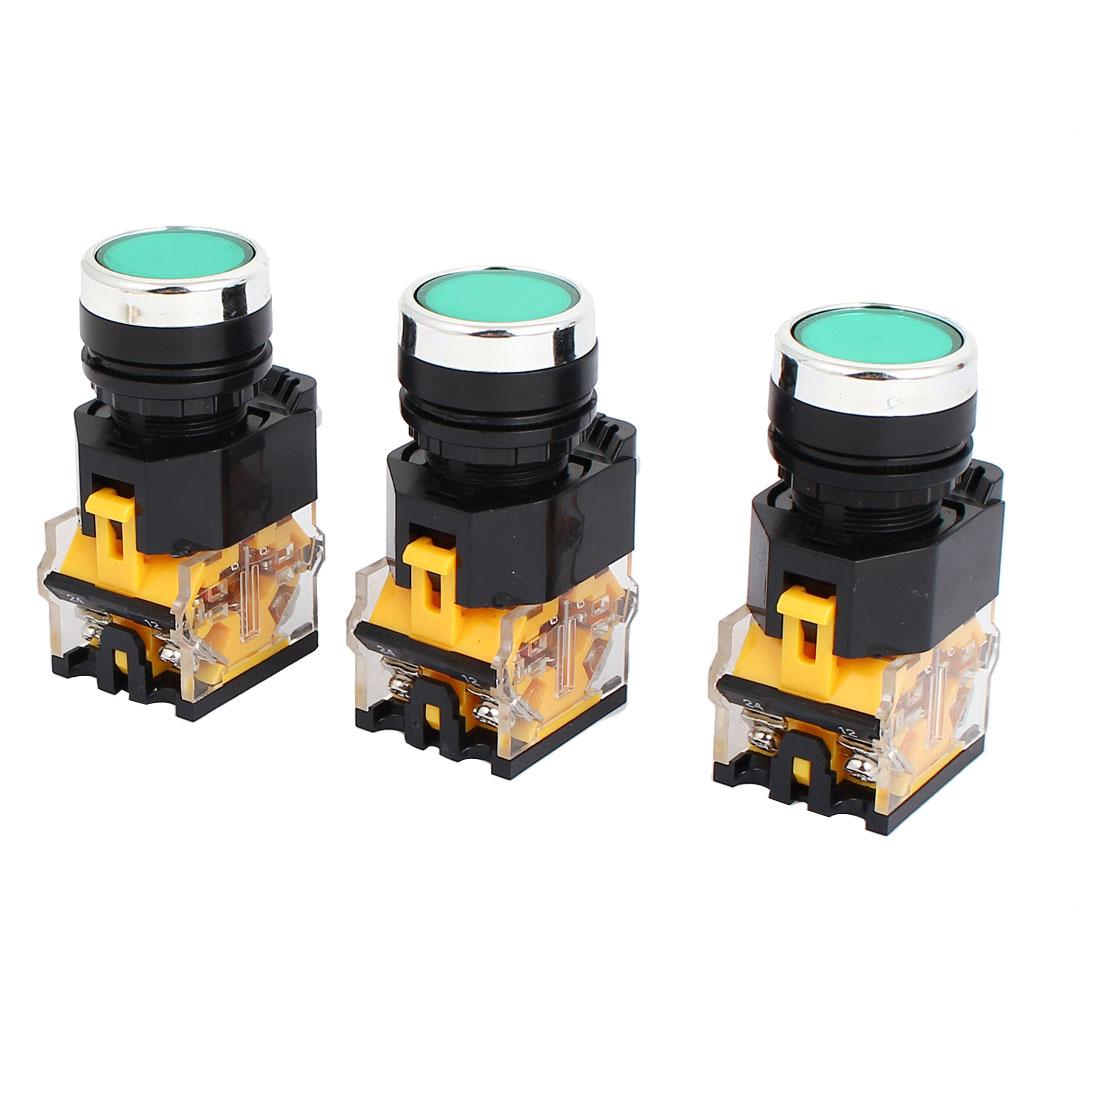 3pcs AC 220V Green Light LED Indicator Panel Mounted Self Locking Push Button Switch 660V 10A